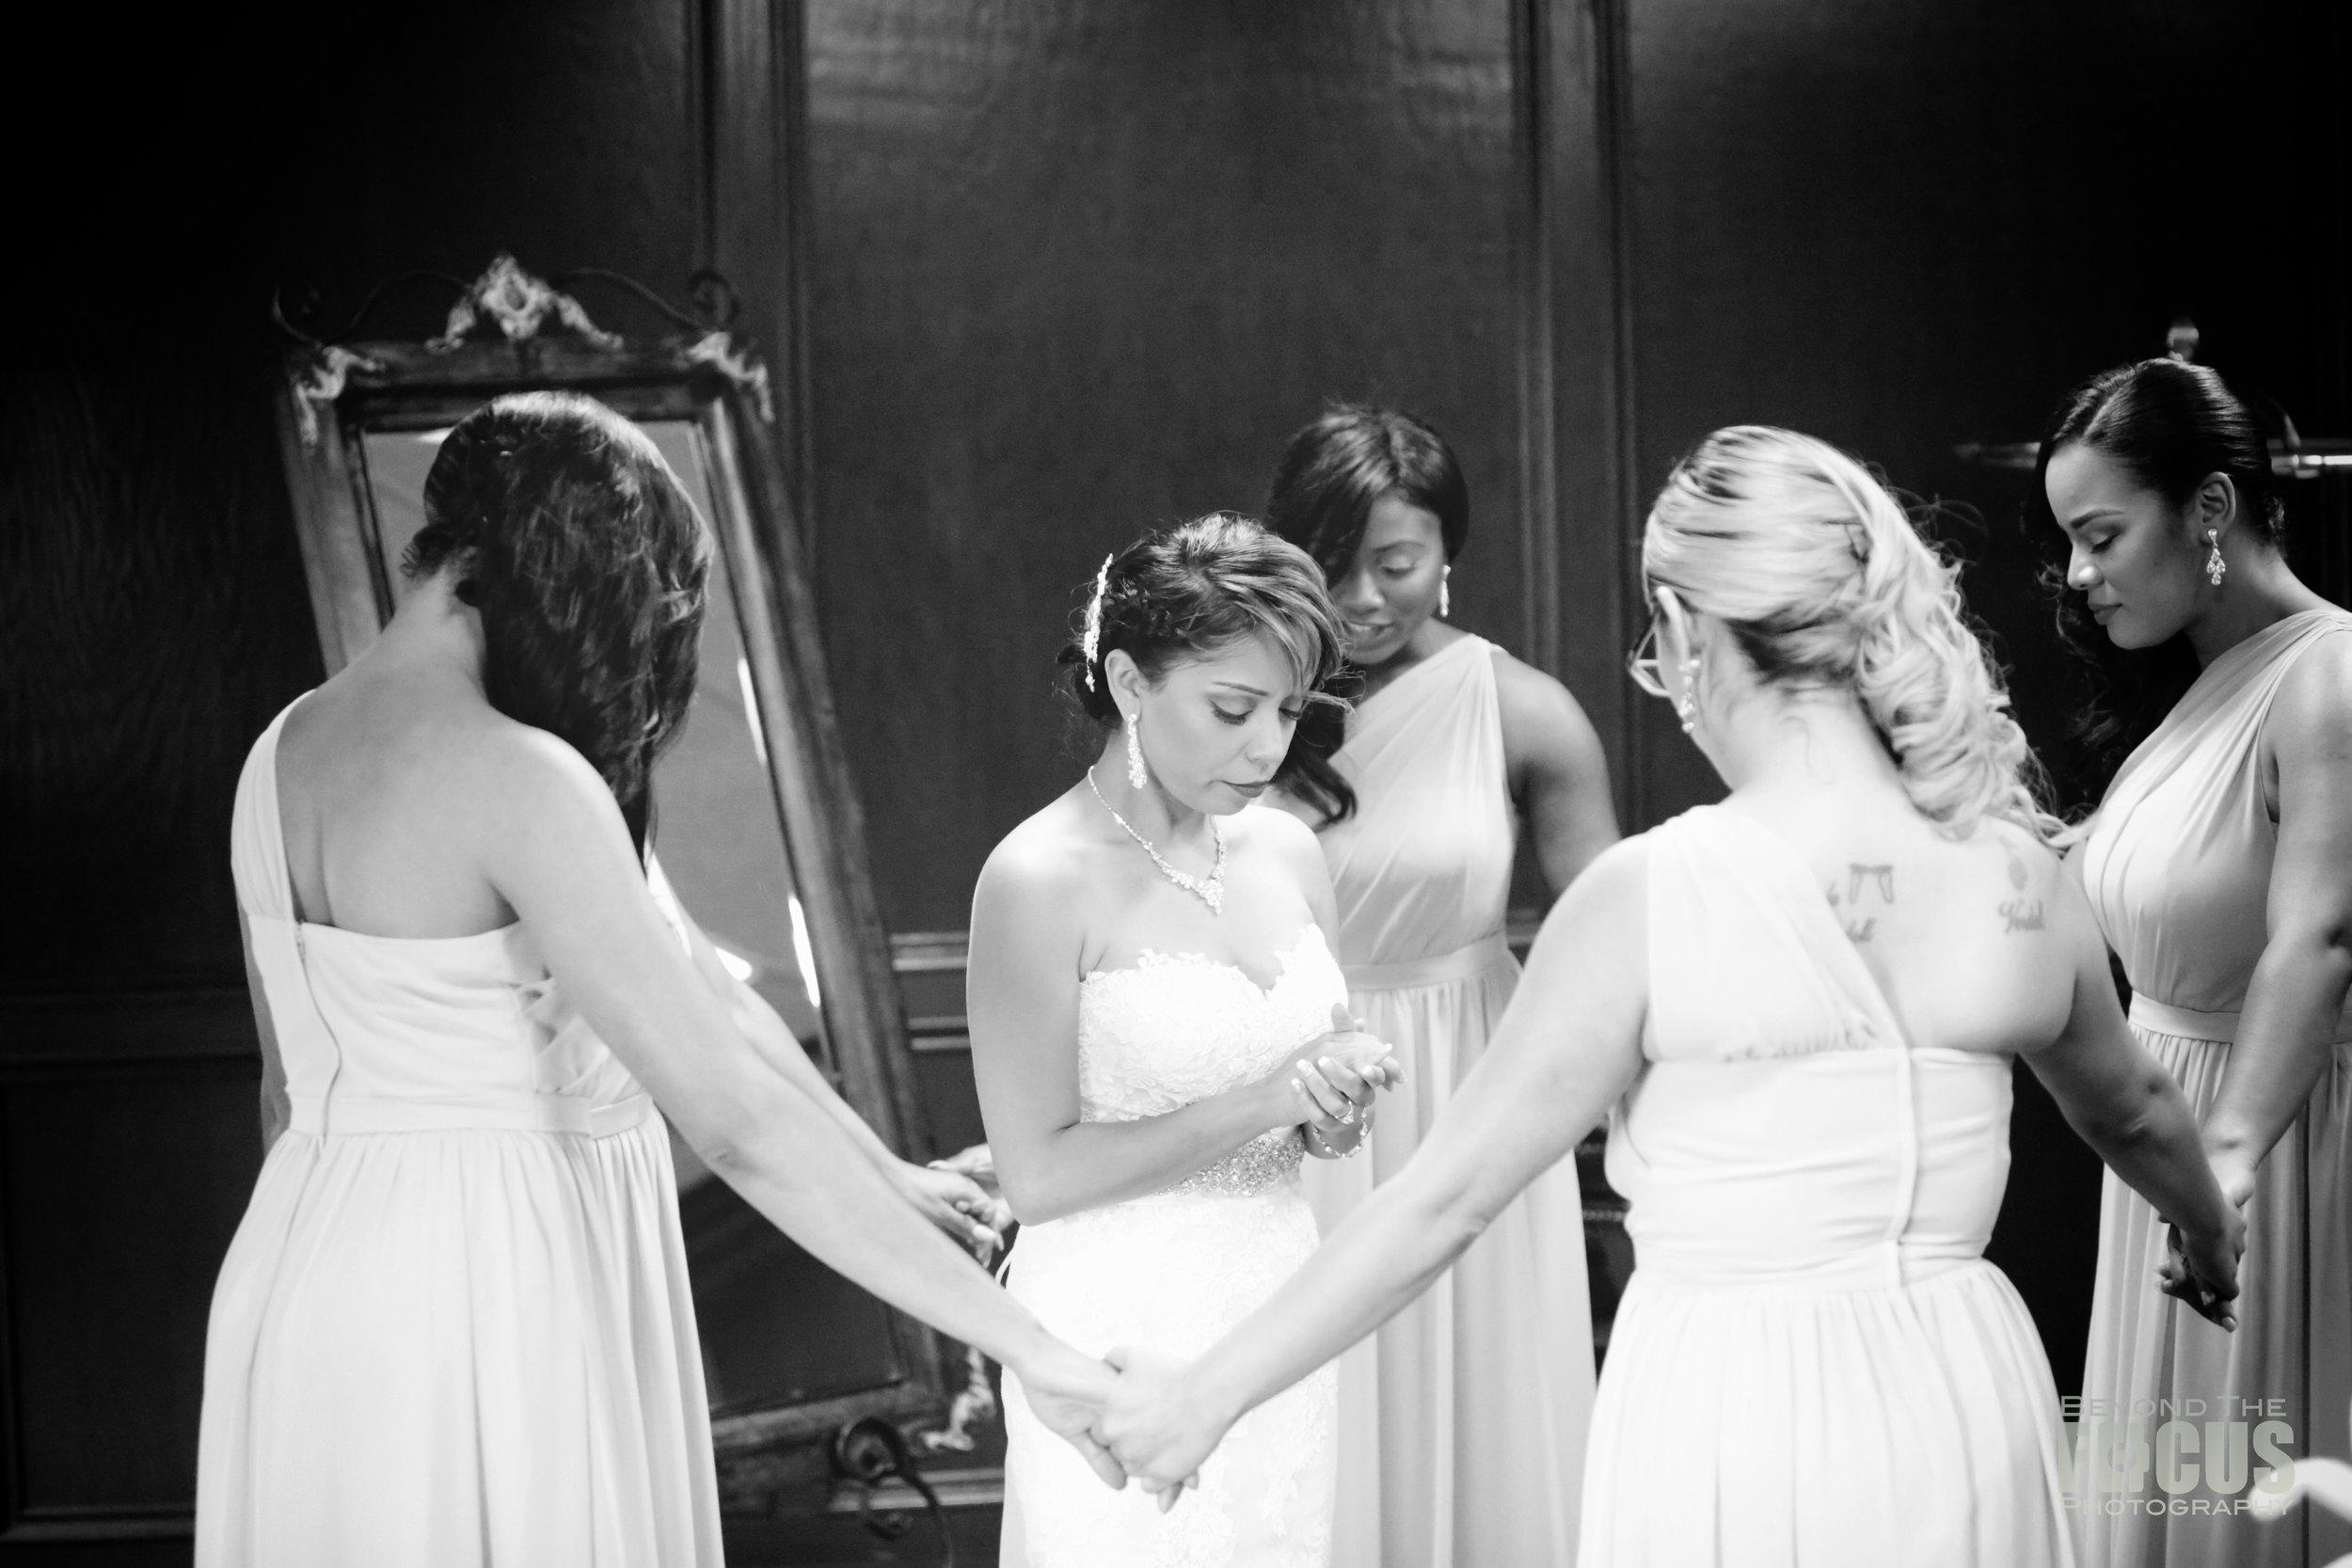 Palmer Wedding - Pre-Wedding Photos 10.jpg